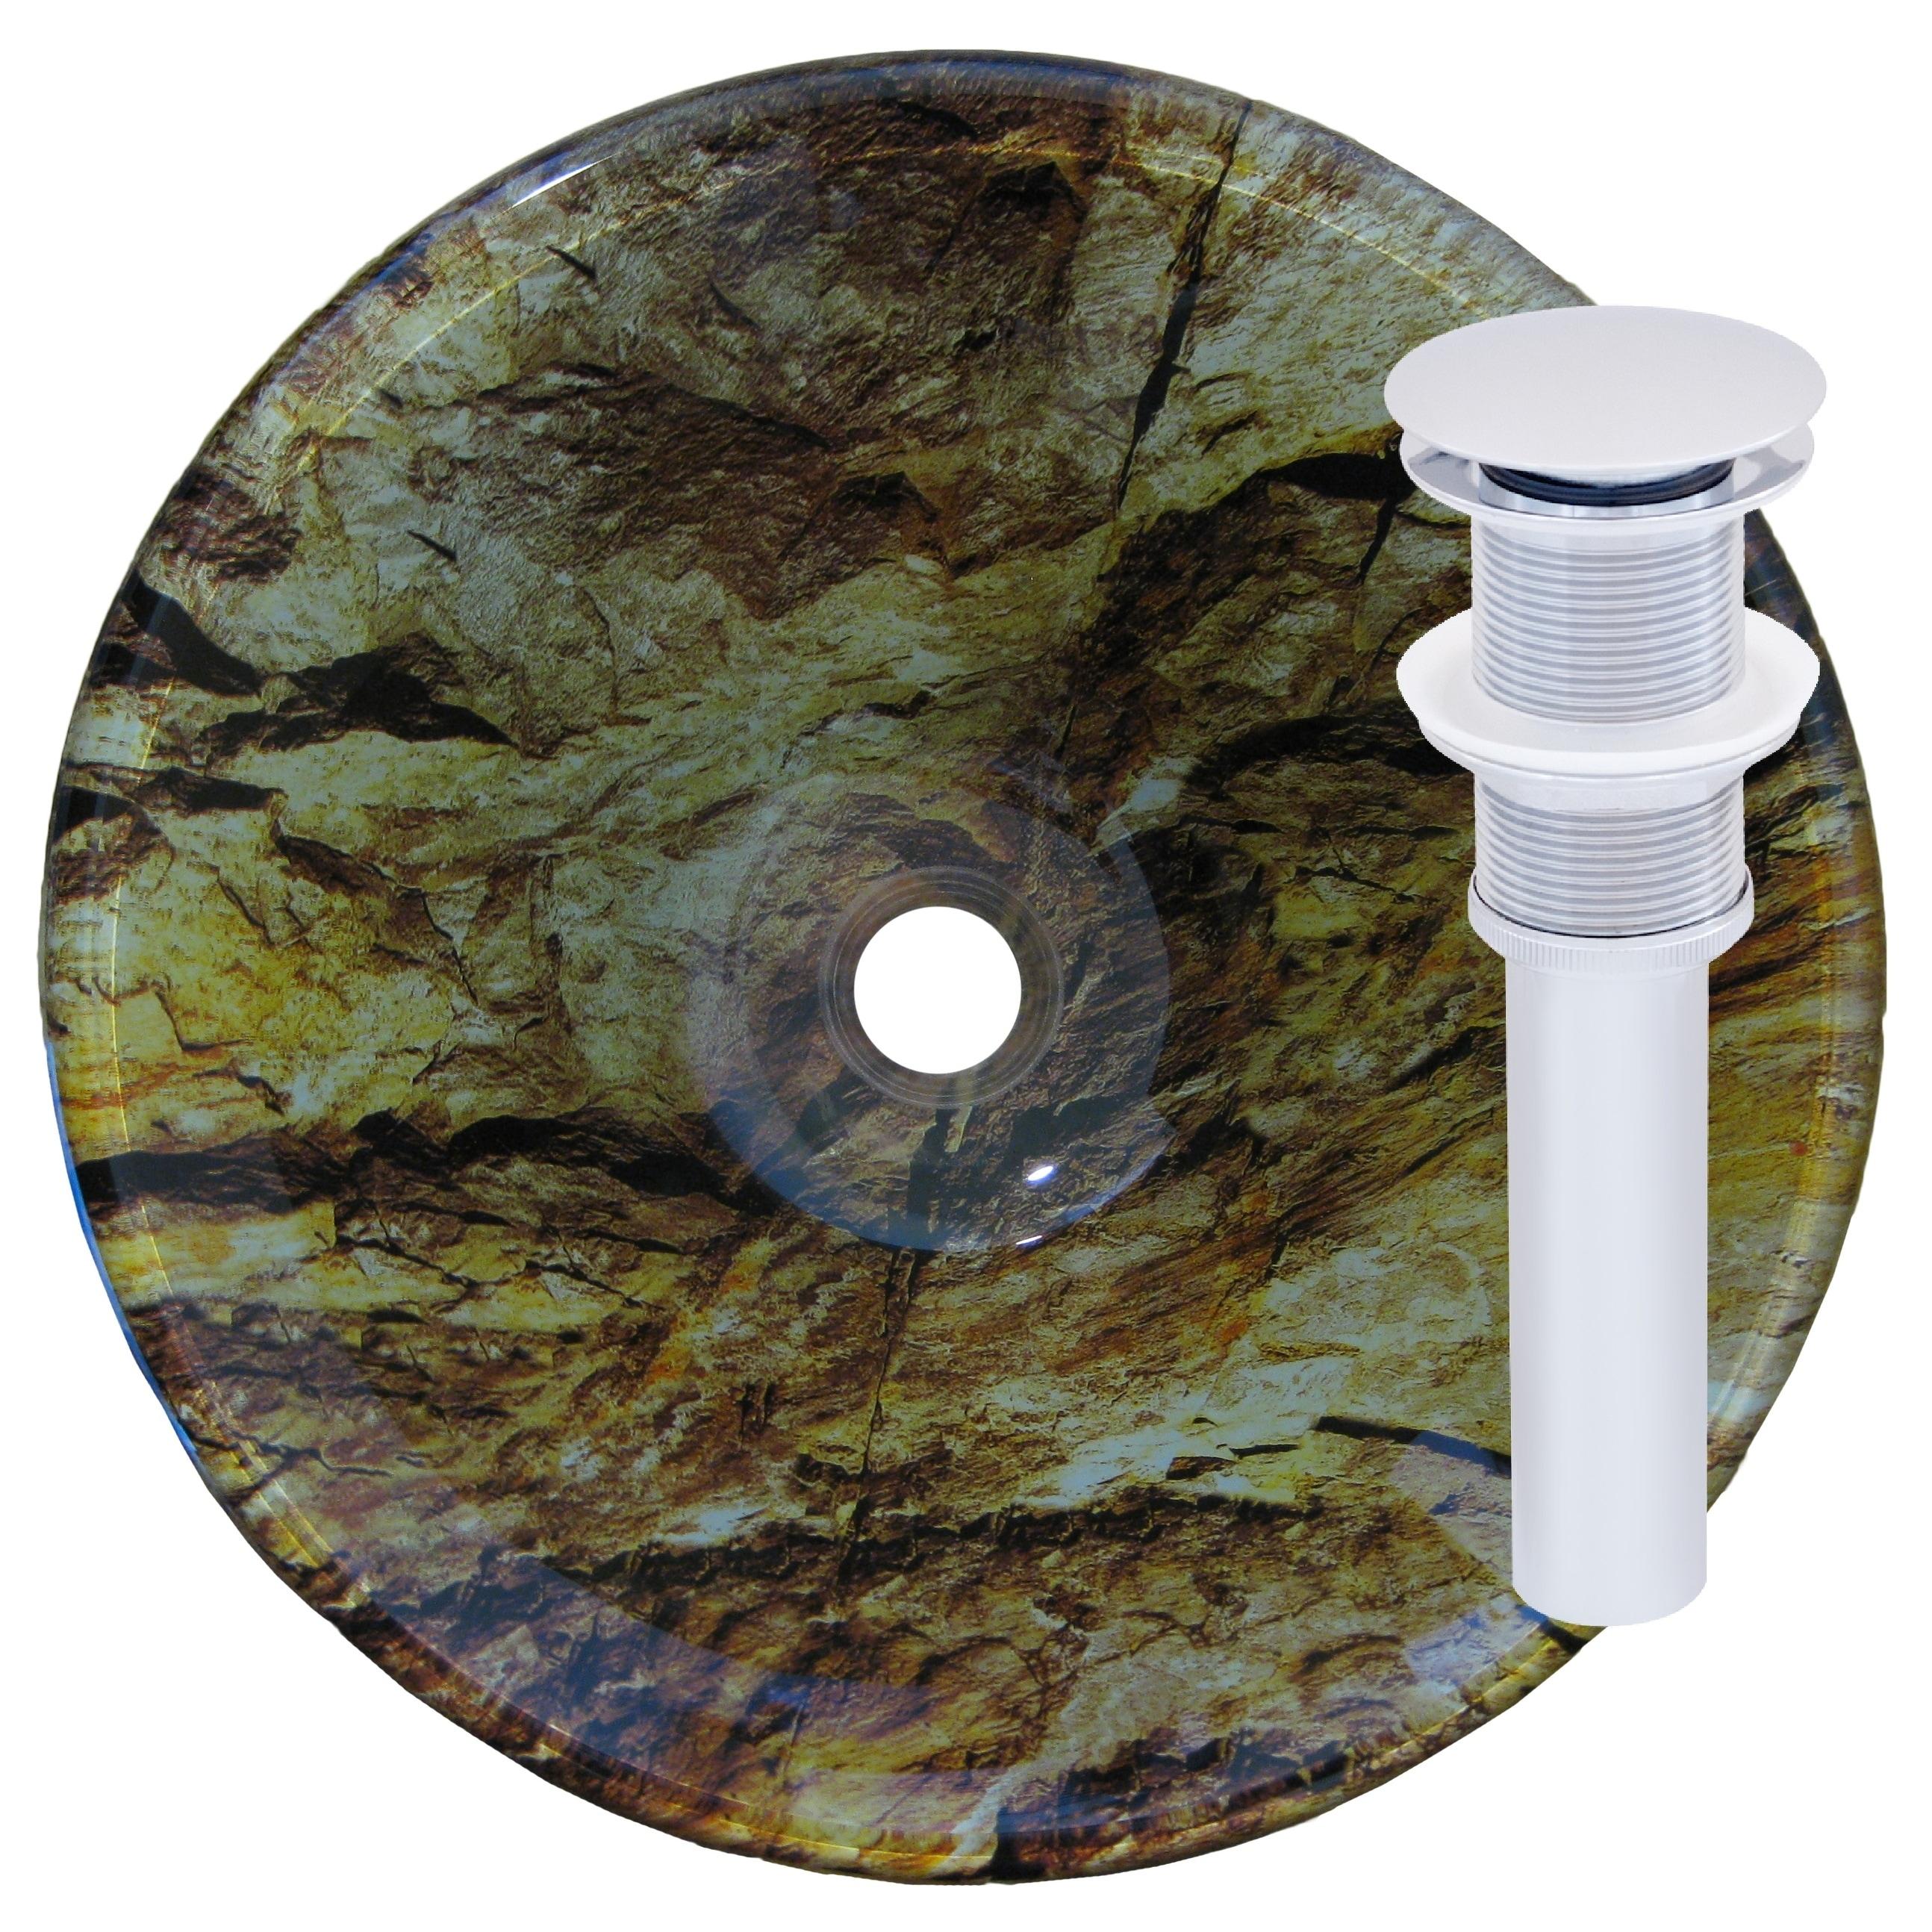 Novatto Mimetizzare Chrome Glass Vessel Bathroom Sink Set...